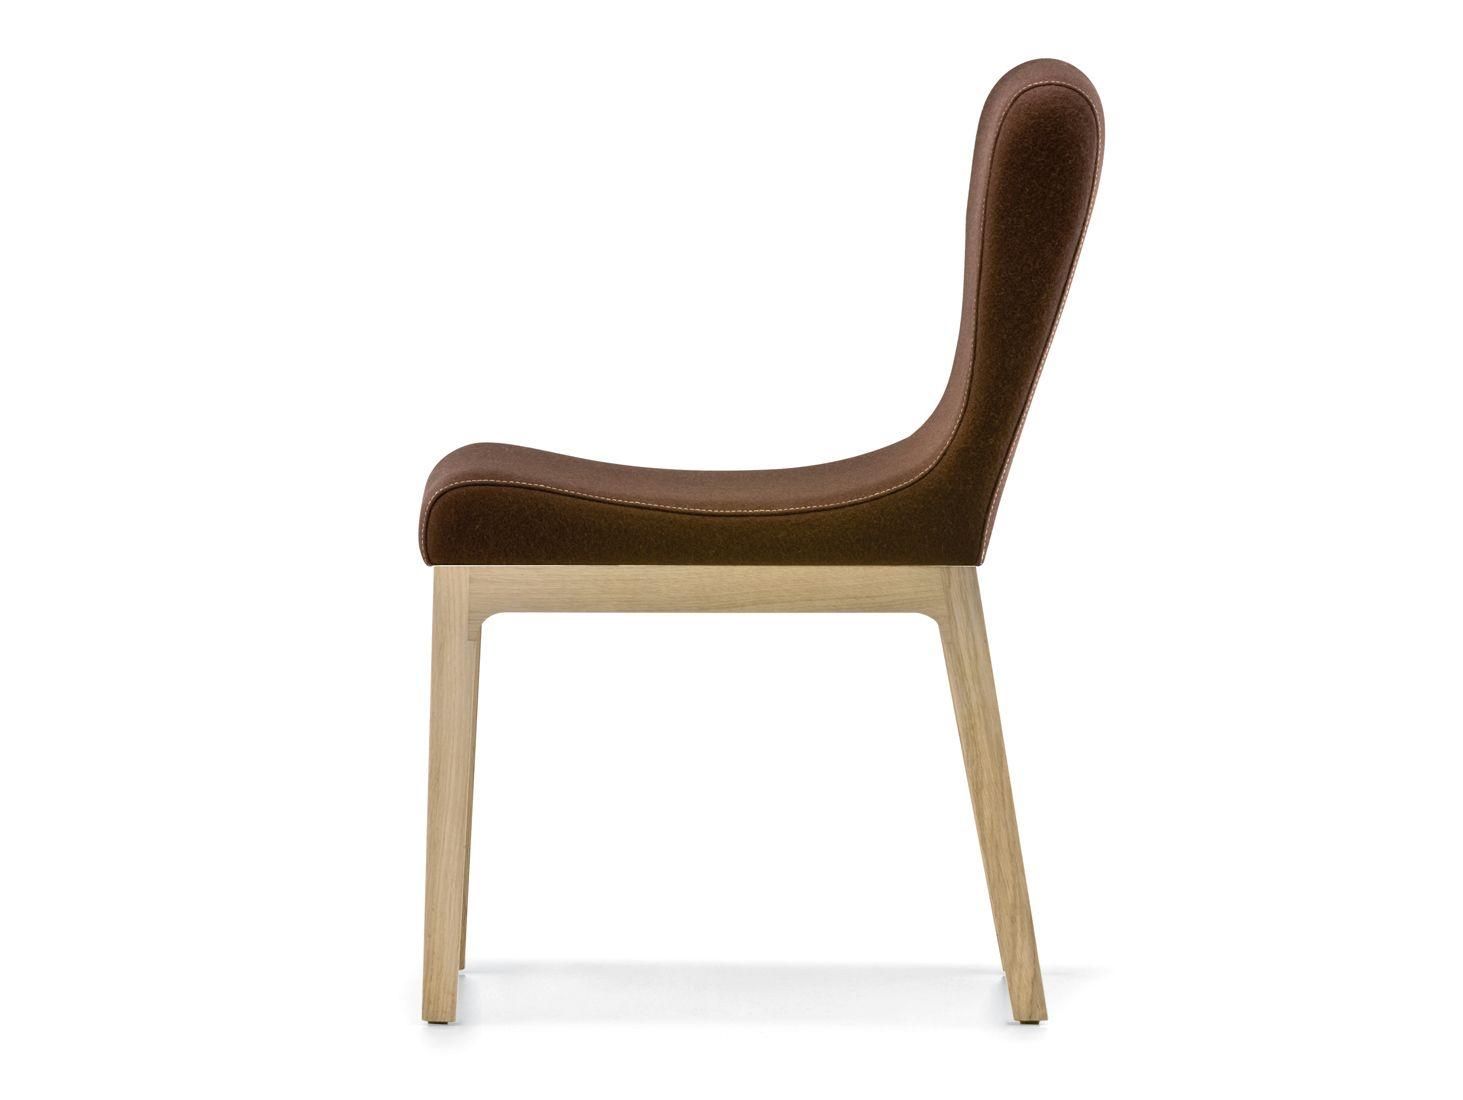 Cadeira estofada de madeira GILDA by PEDRALI design Roberto Semprini #382410 1463x1100